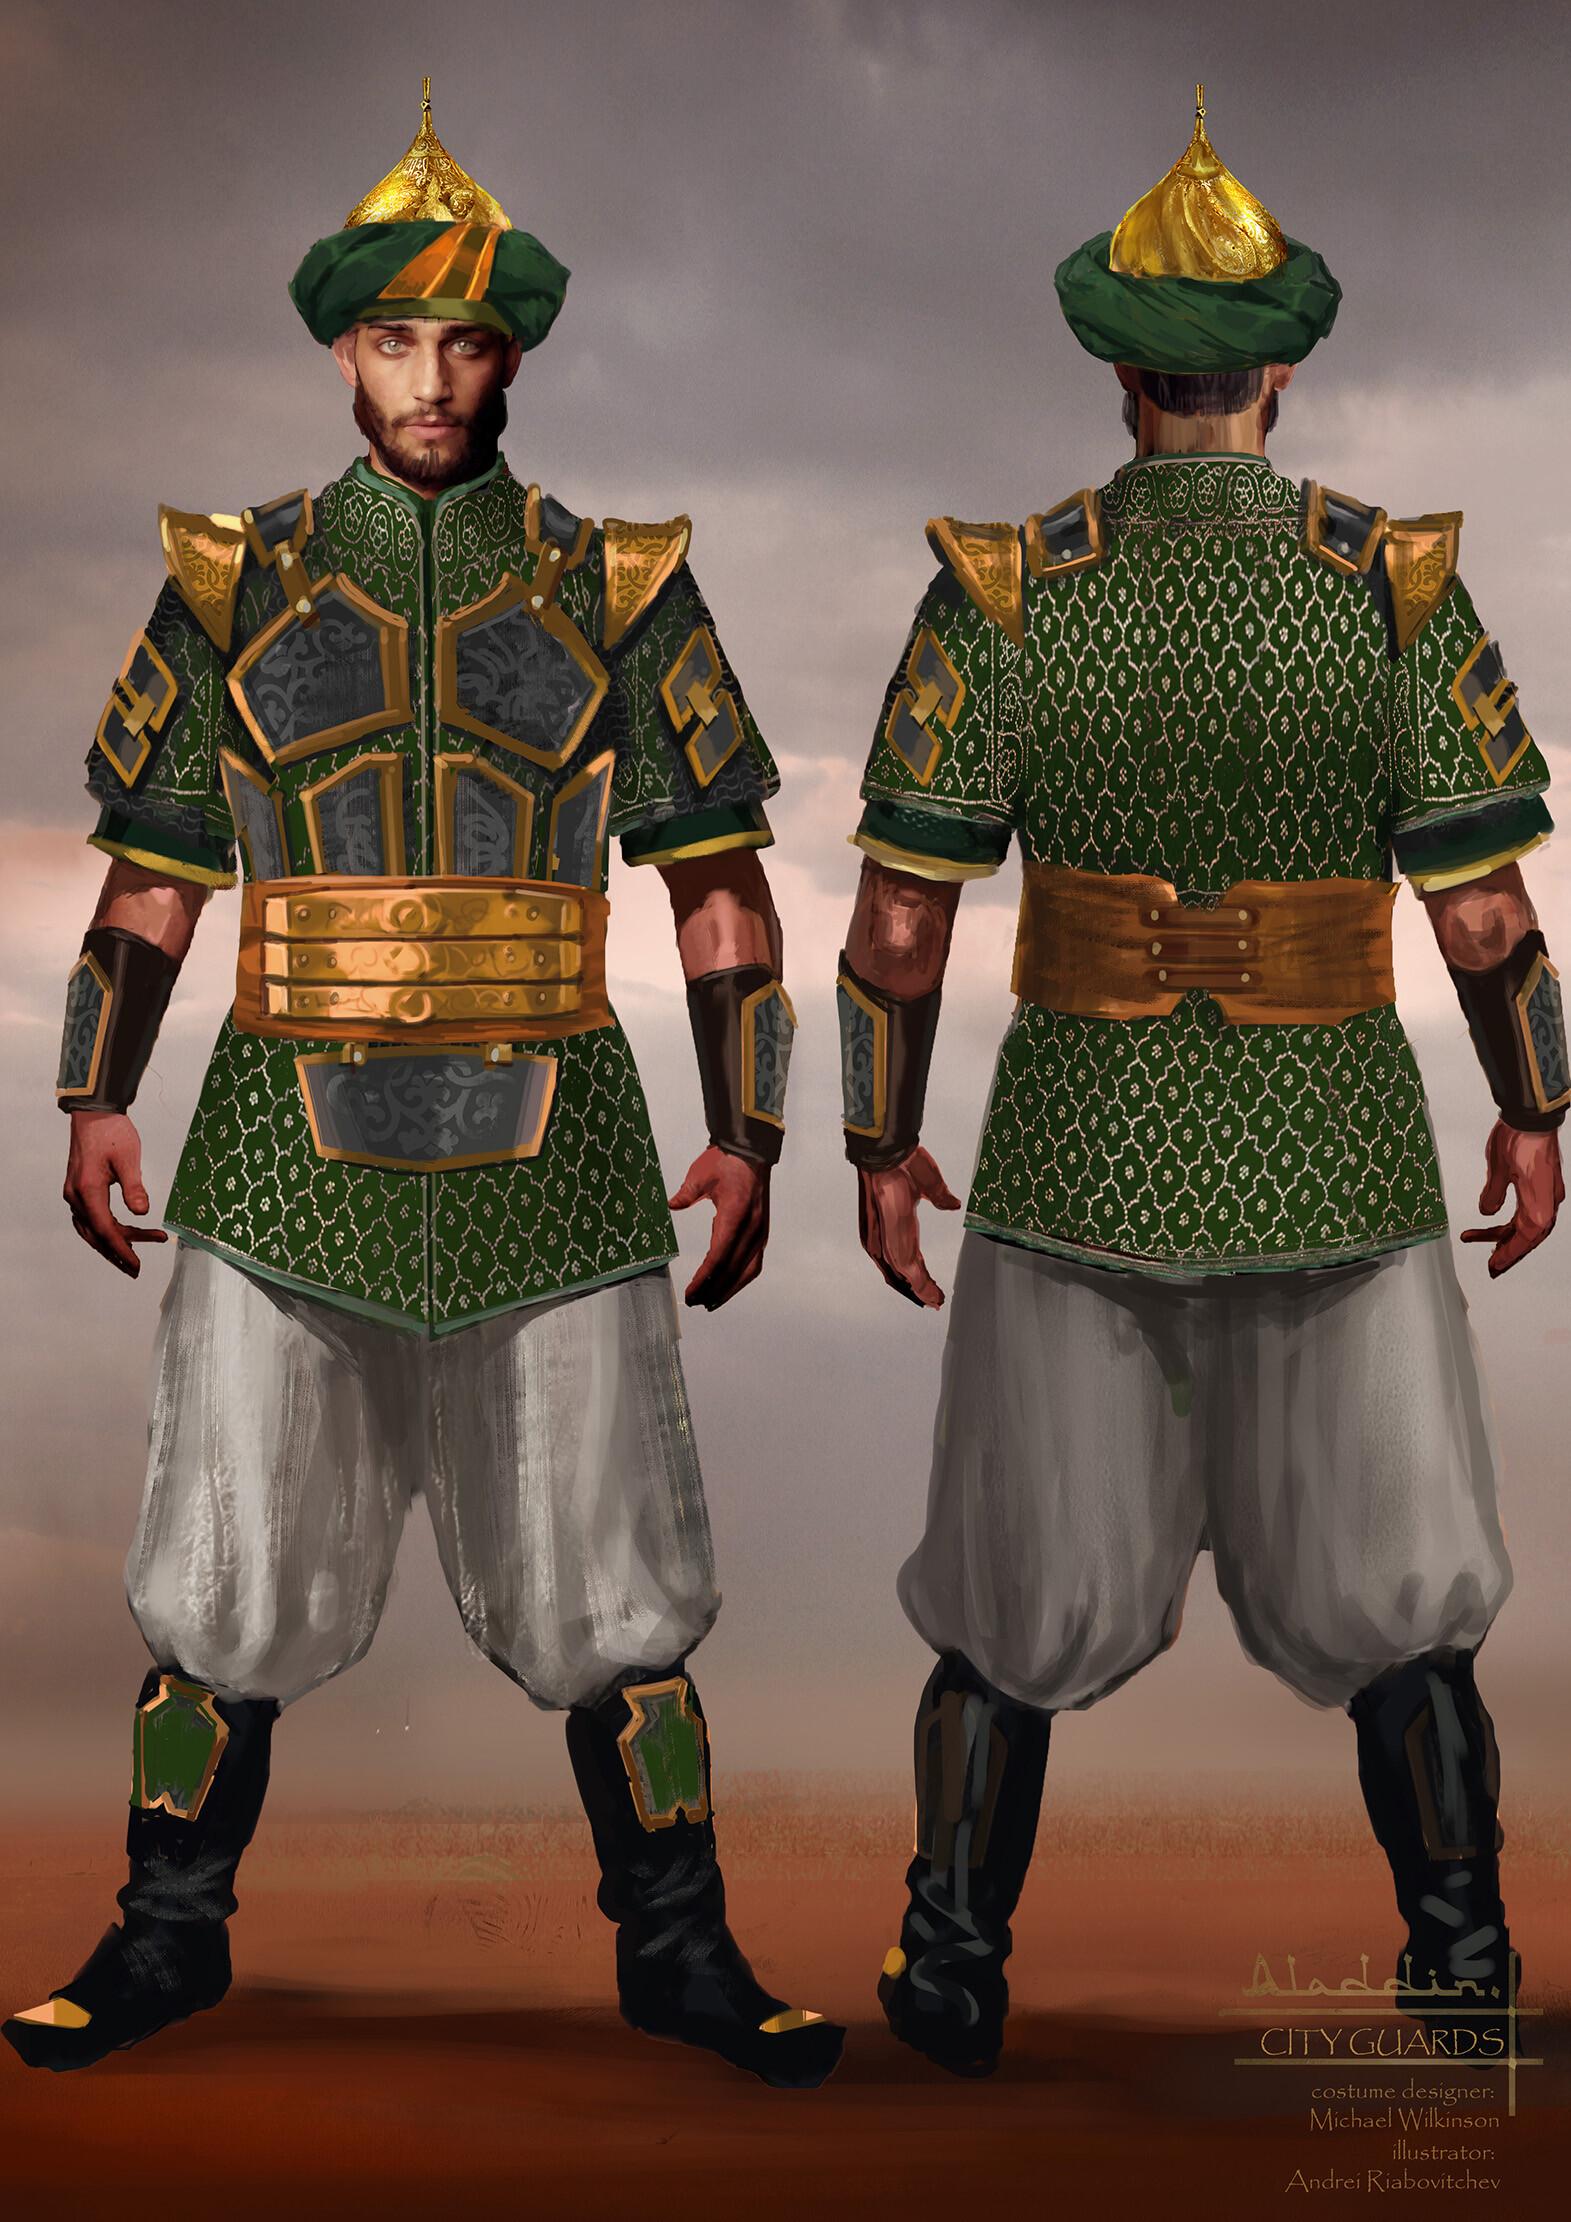 Aladdin [Disney - 2019] - Page 43 Andrei-riabovitchev-city-guards-05-04-2017-v001-007-ar